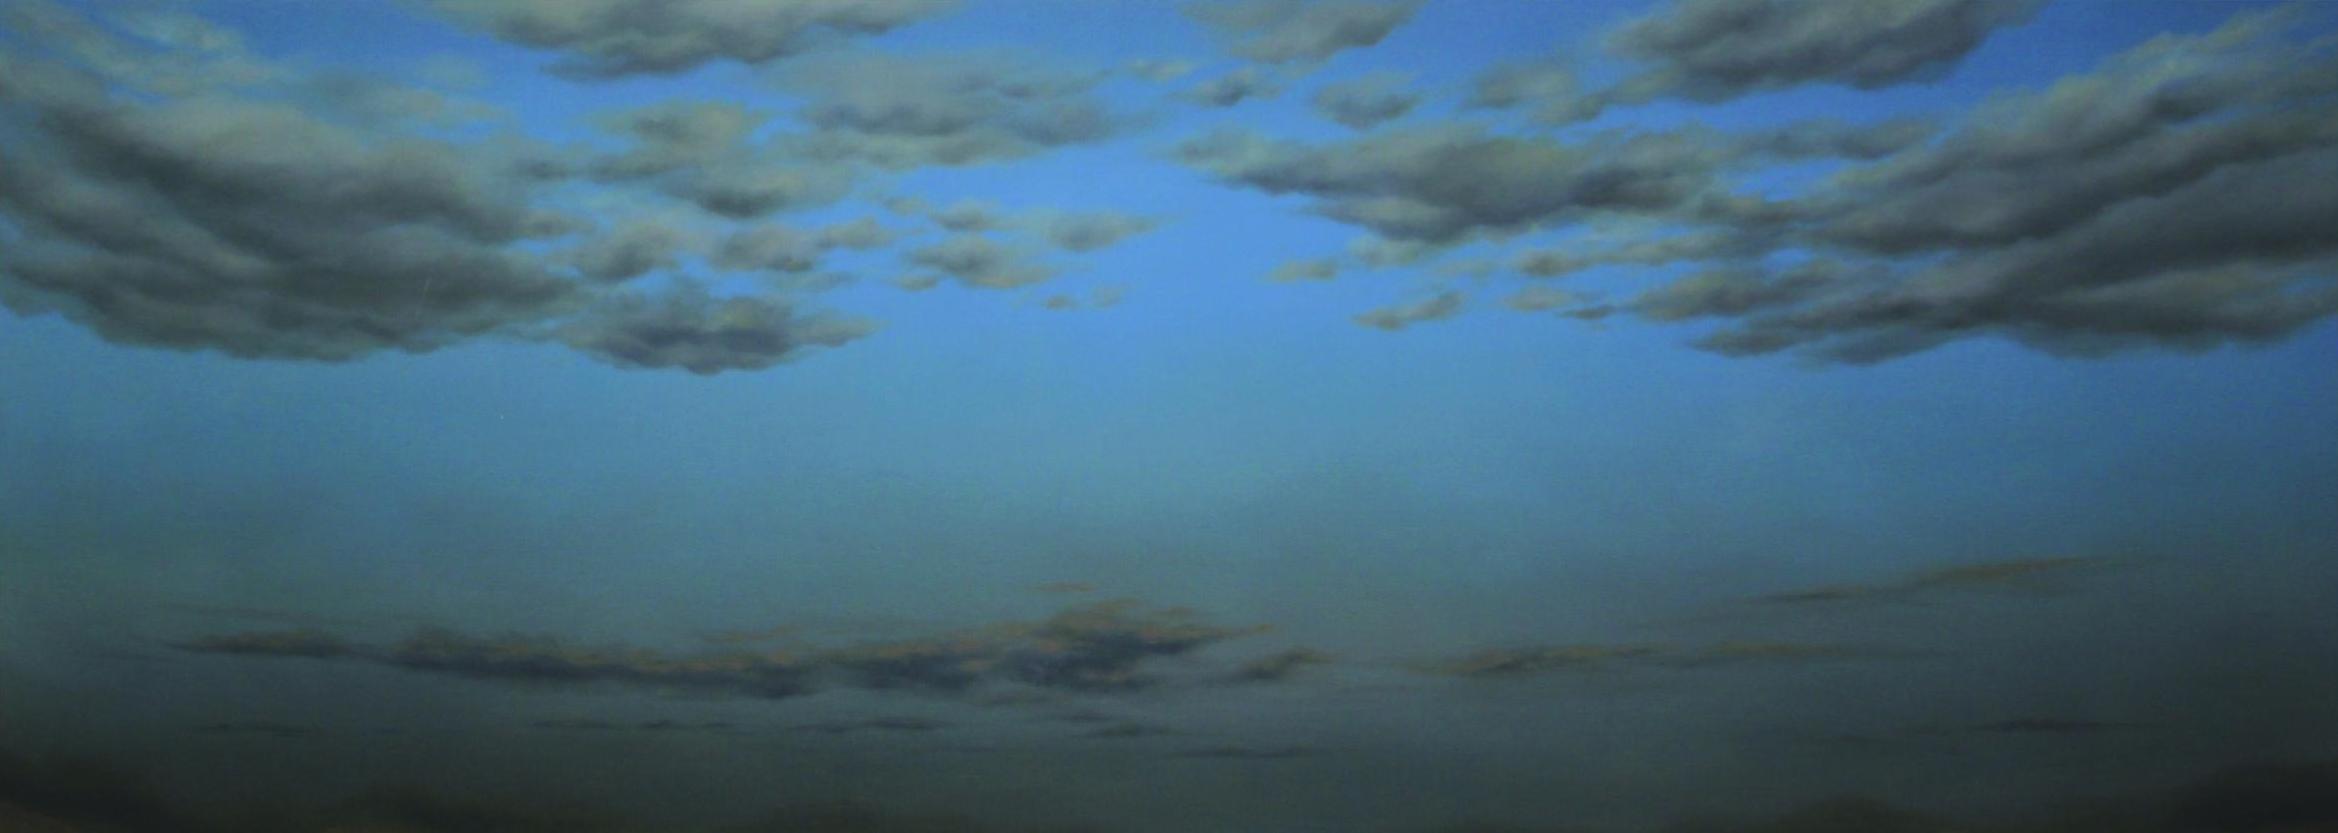 Radhika Kacha   Untitled   2017   Oil on Canvas   52 x 140 in.